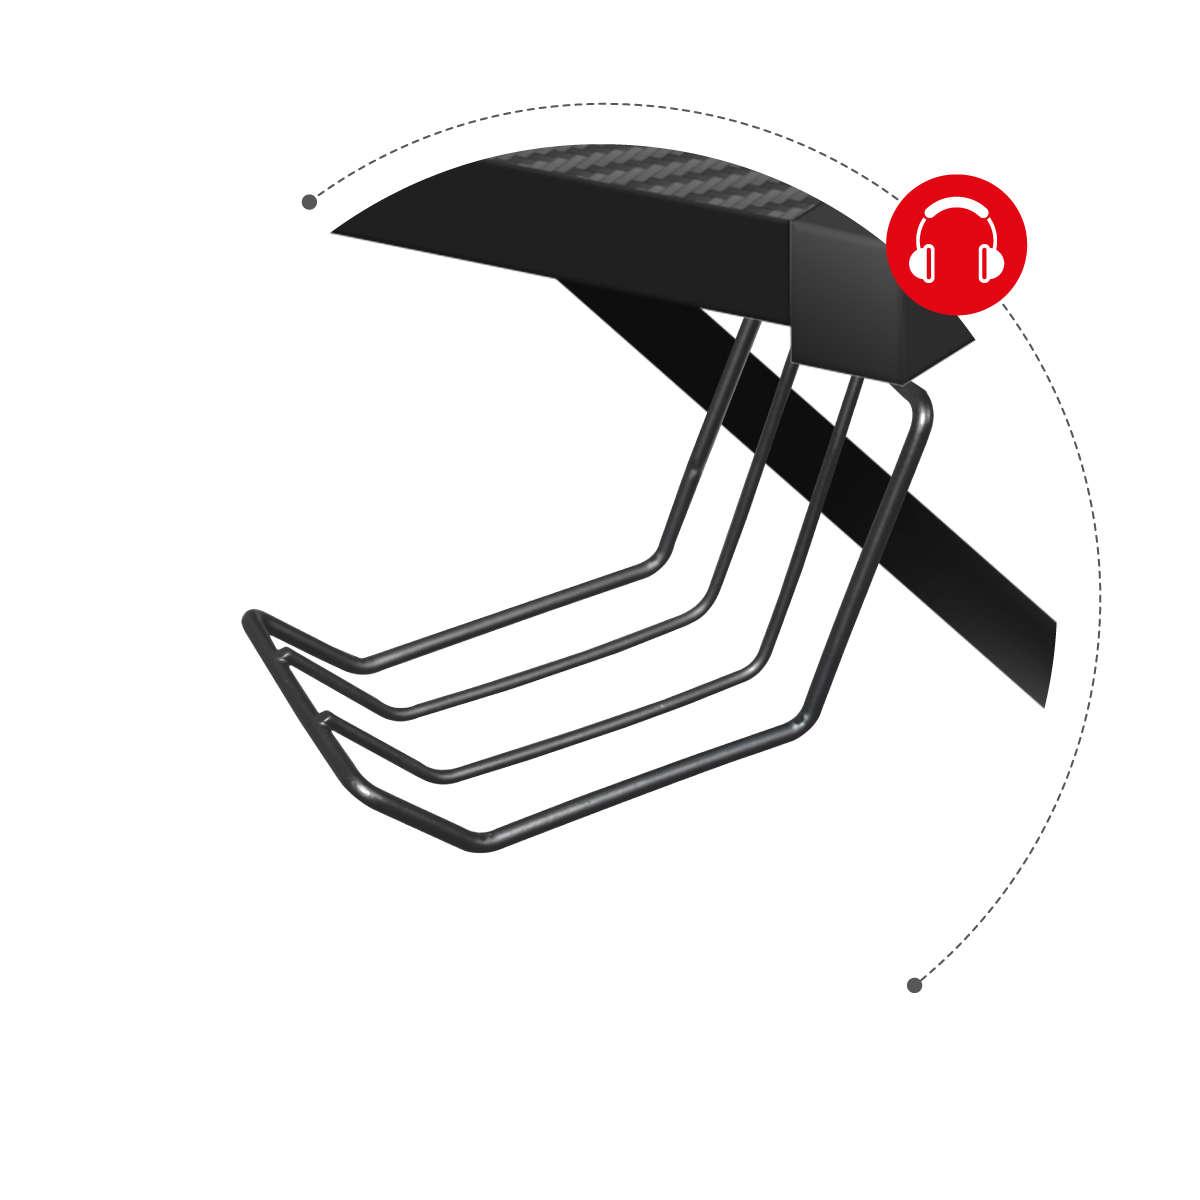 Huzaro Hero 6.3 uchwyt na słuchawki